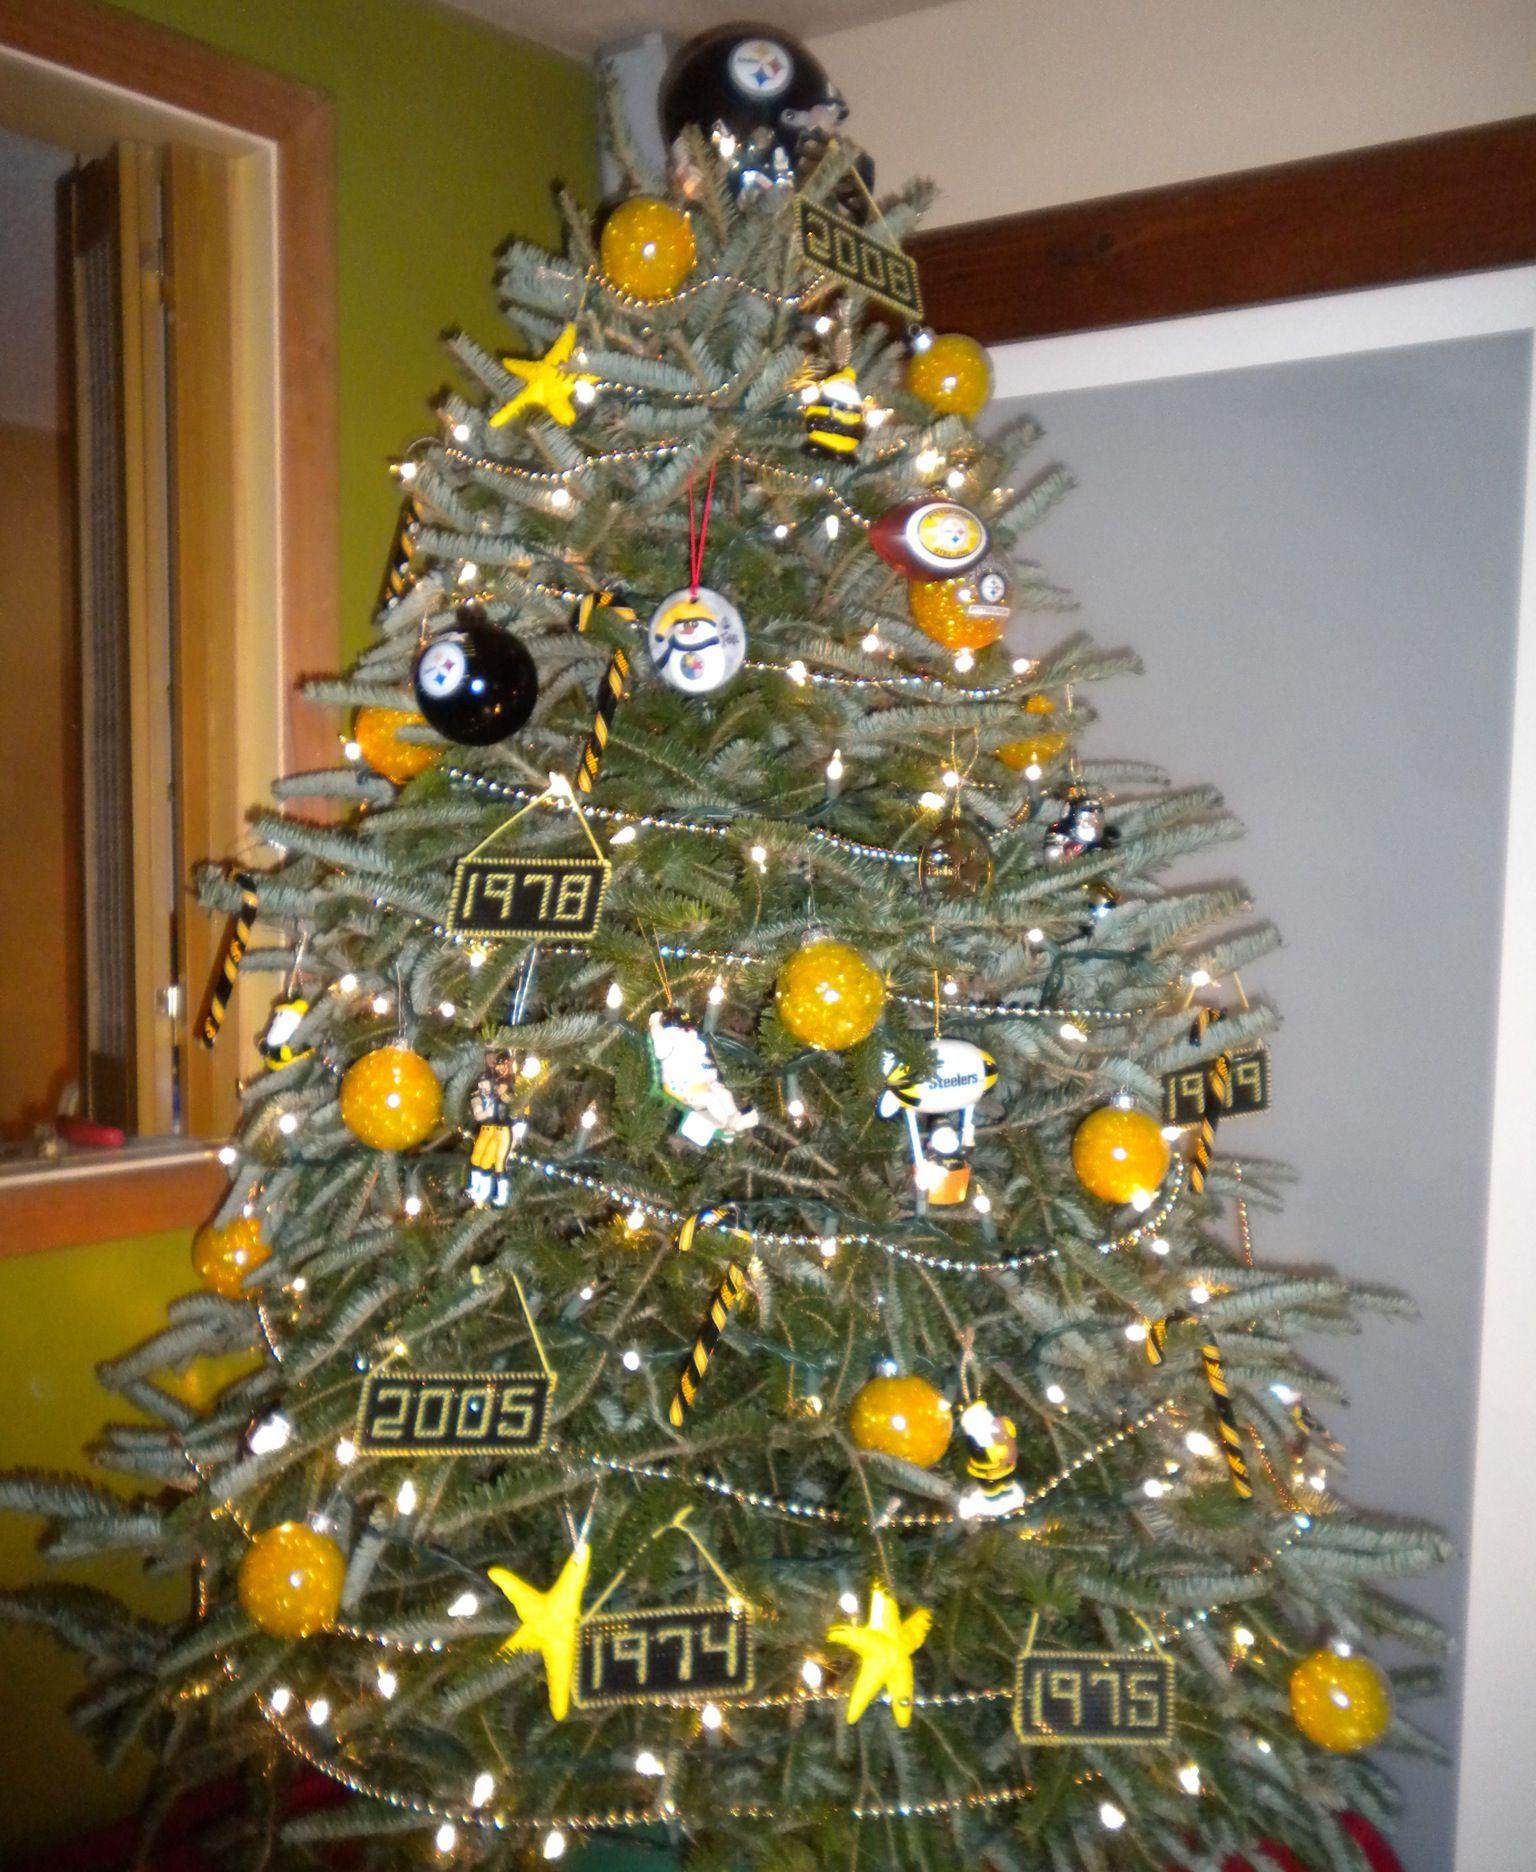 Steelers Christmas tree. | Pittsburgh | Pinterest | Pittsburgh ...